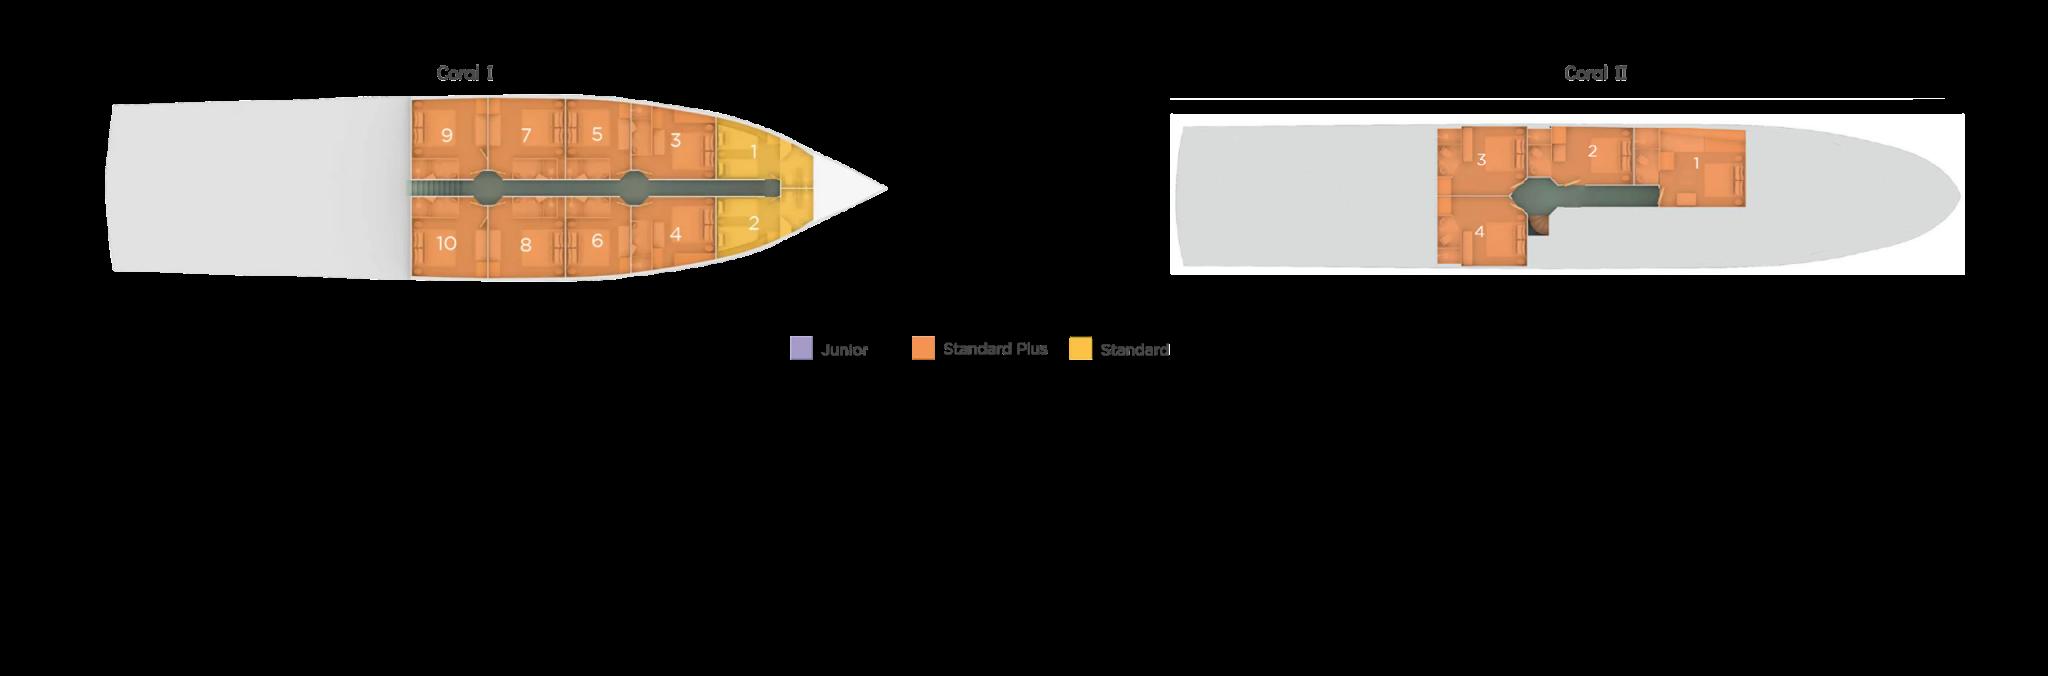 Sea Deck   Coral Yacht